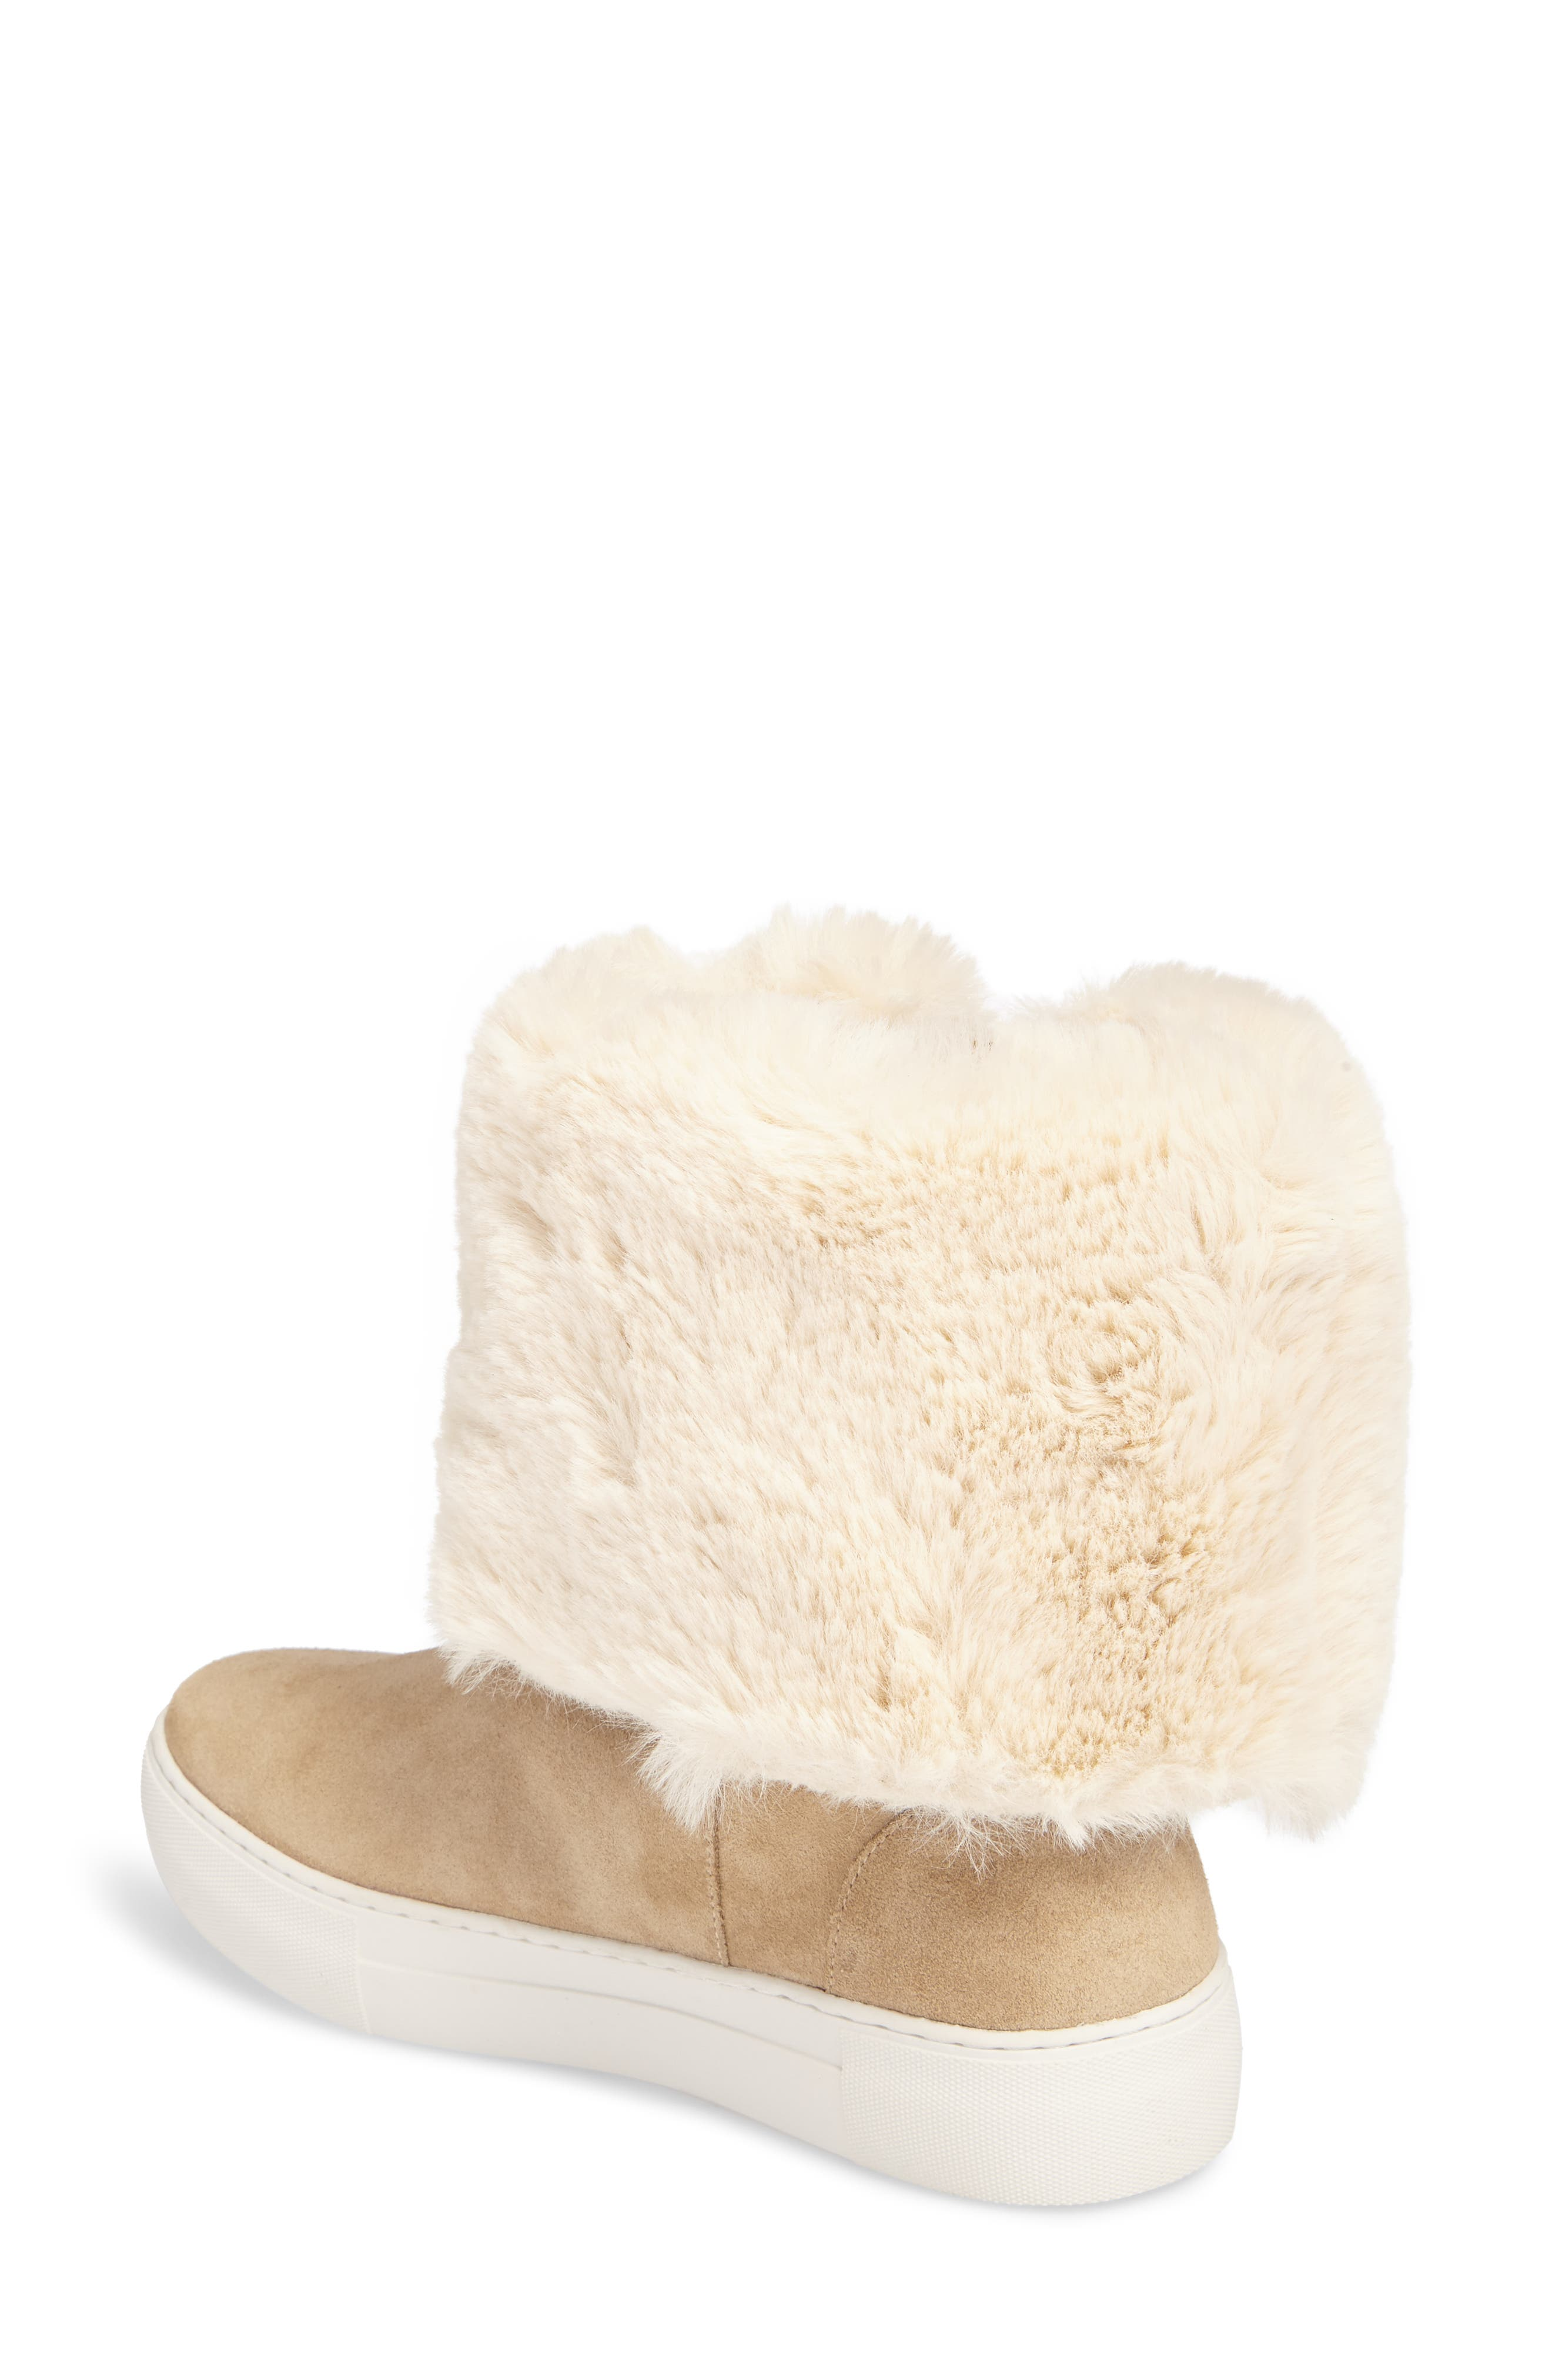 J/Slides | Apple Faux Shearling Boot